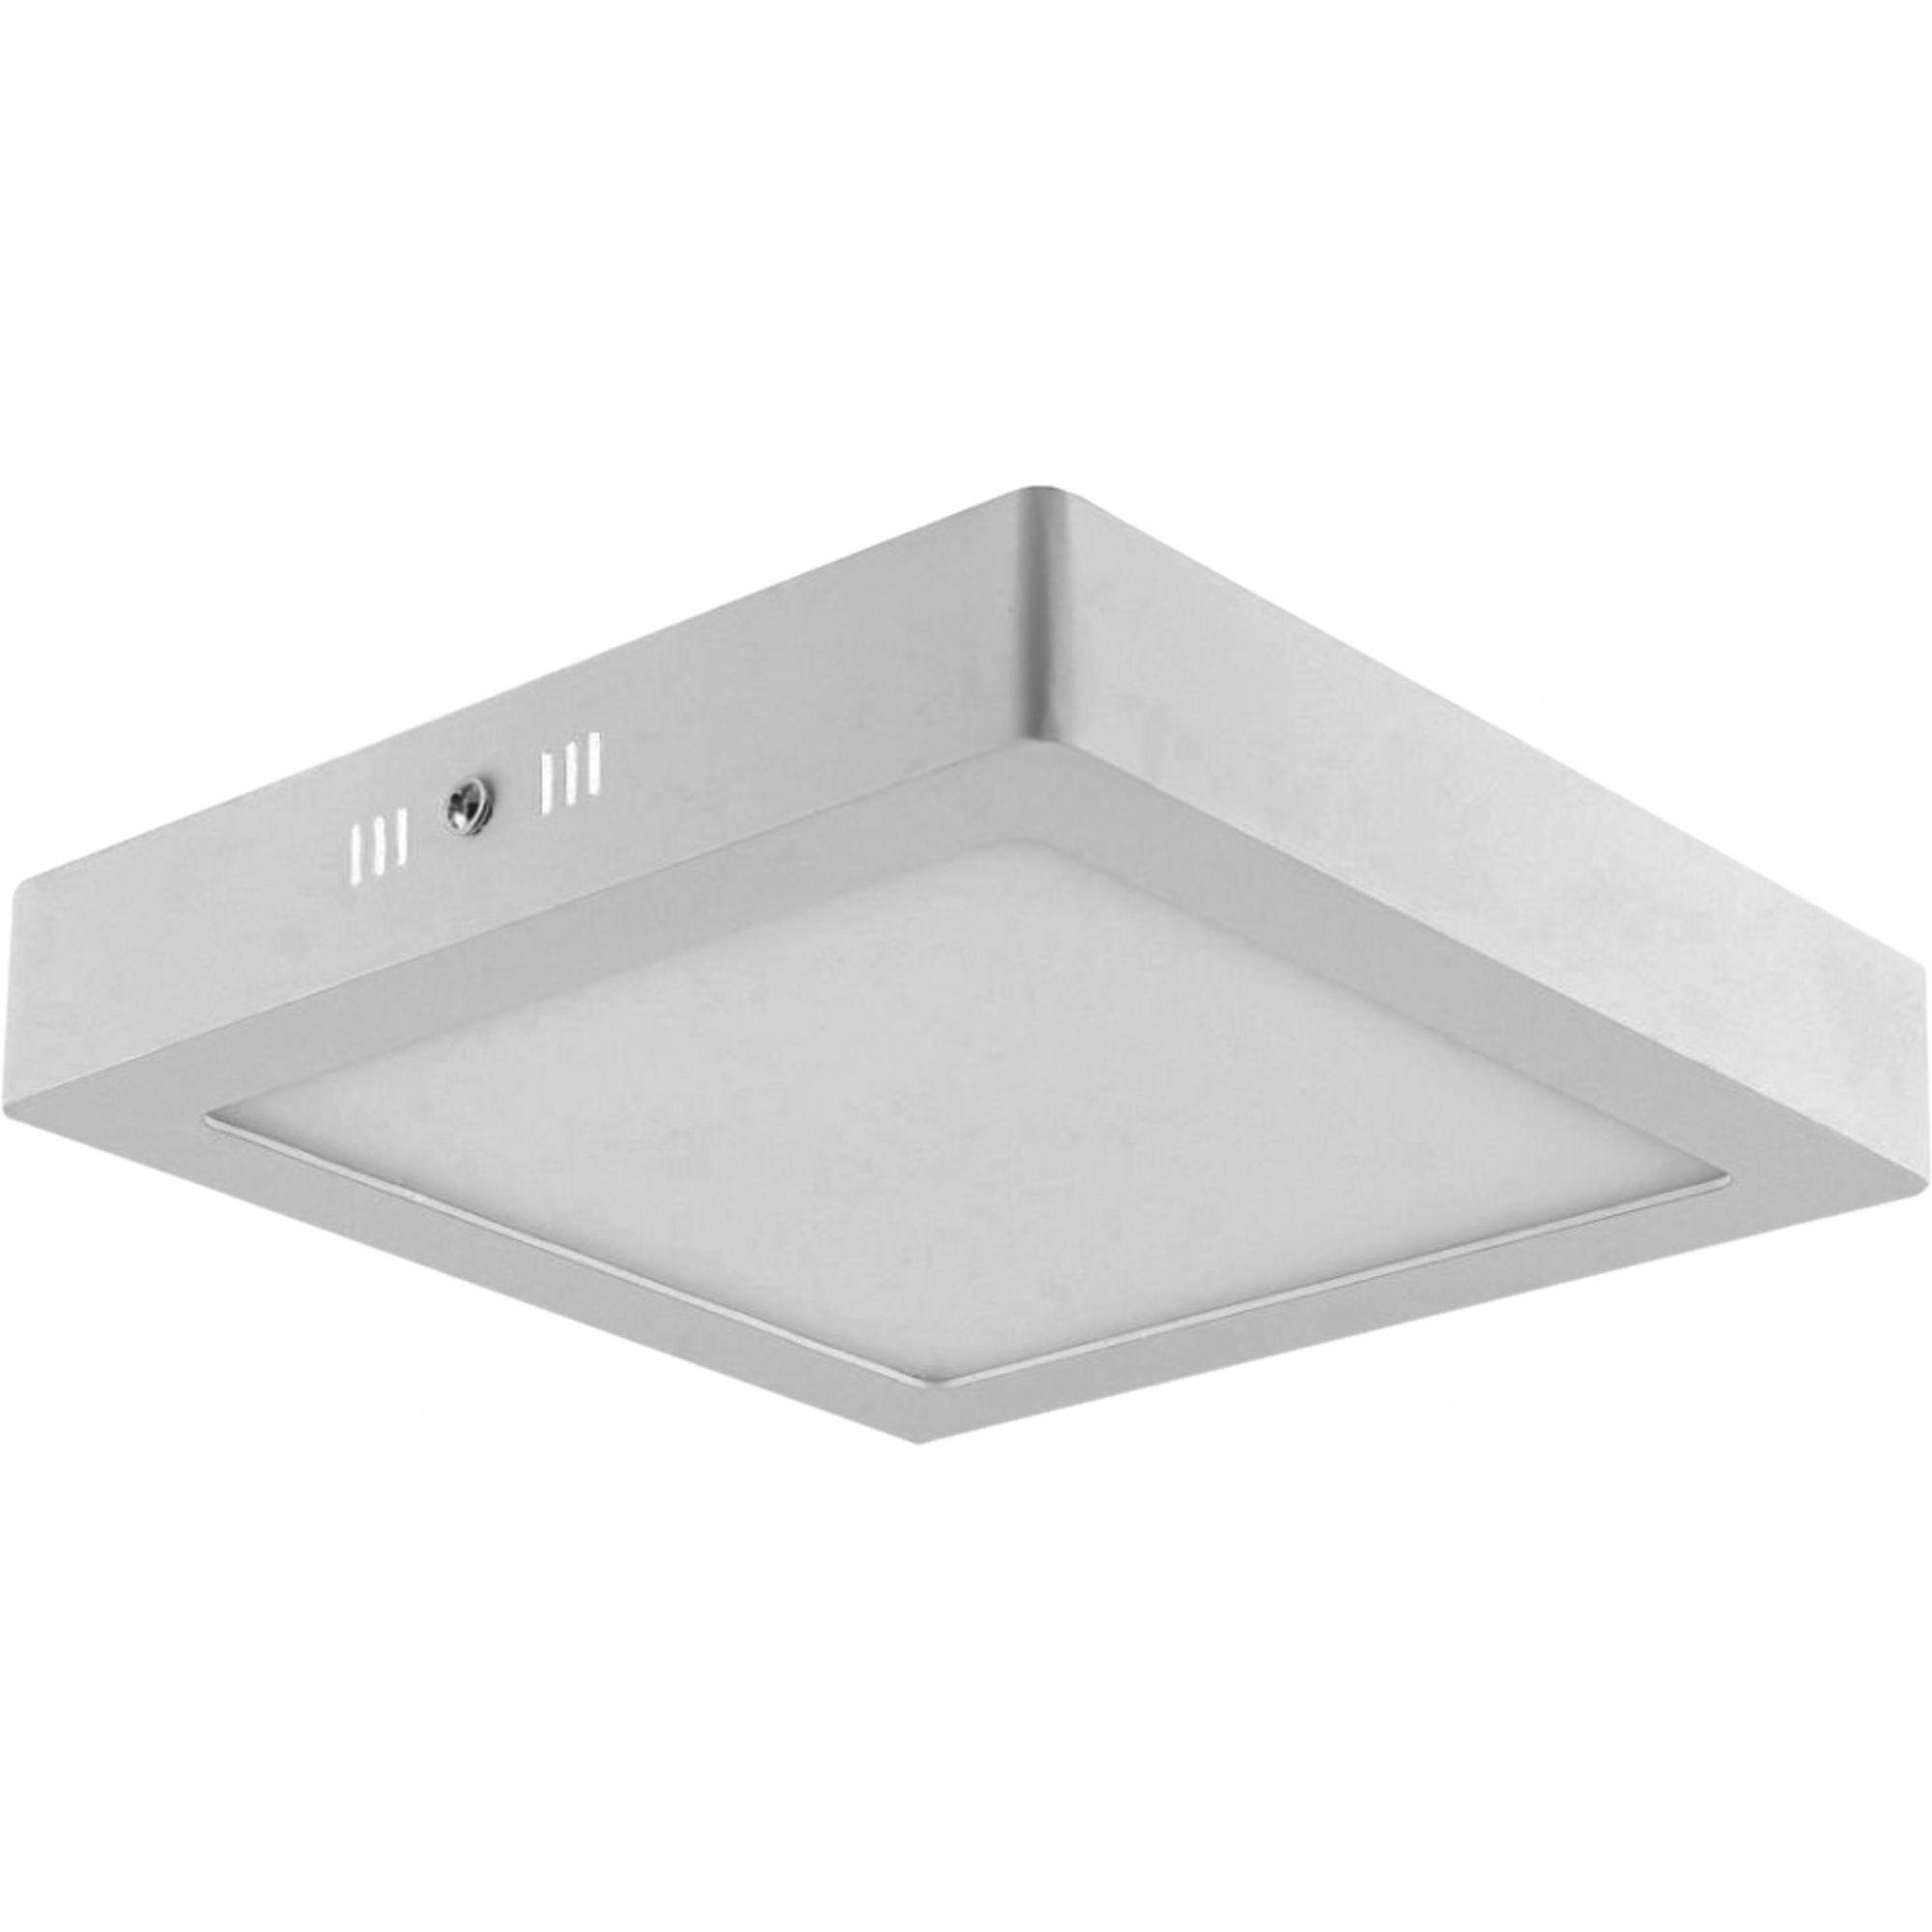 Painel LED Sobrepor Dimerizável 18W 22X22CM Quadrado 110V  - Branco Neutro 4000K